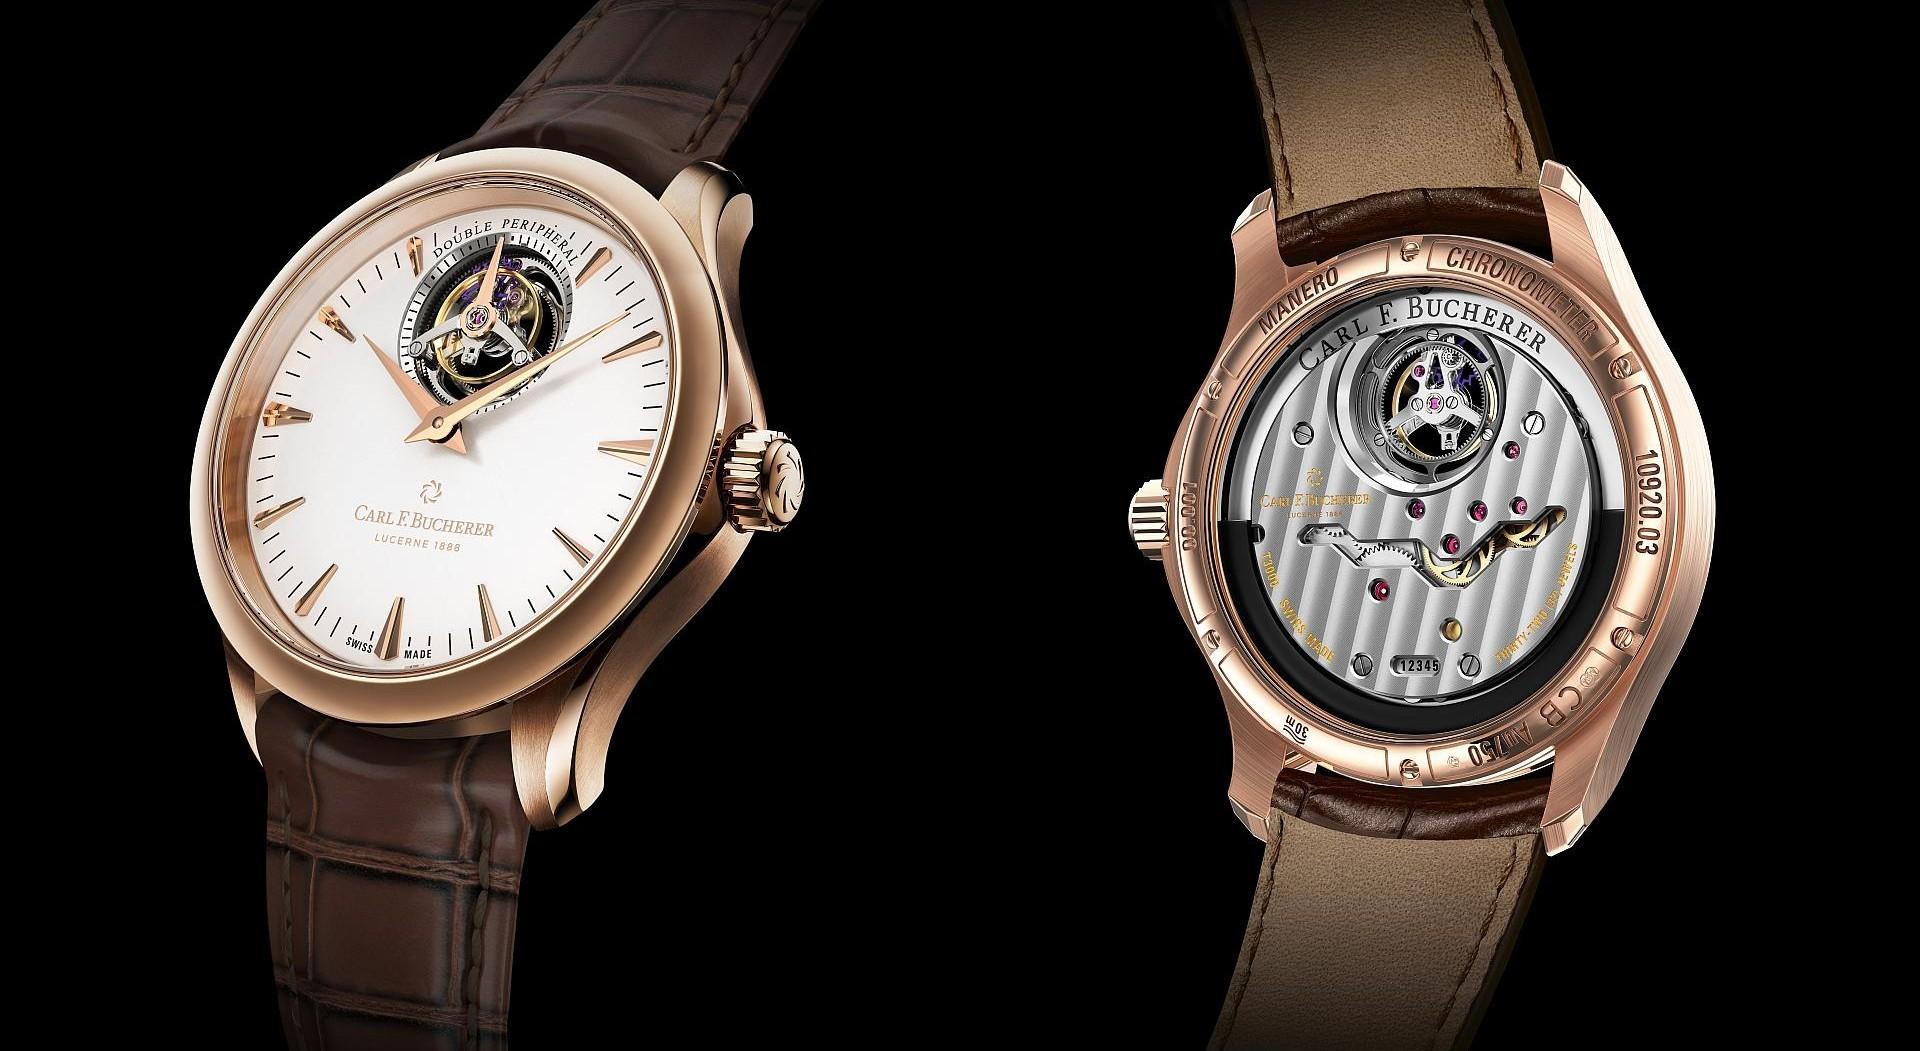 【Baselworld 2018錶展報導】寶齊萊Manero Tourbillon DoublePeripheral馬利龍雙外緣陀飛輪腕錶